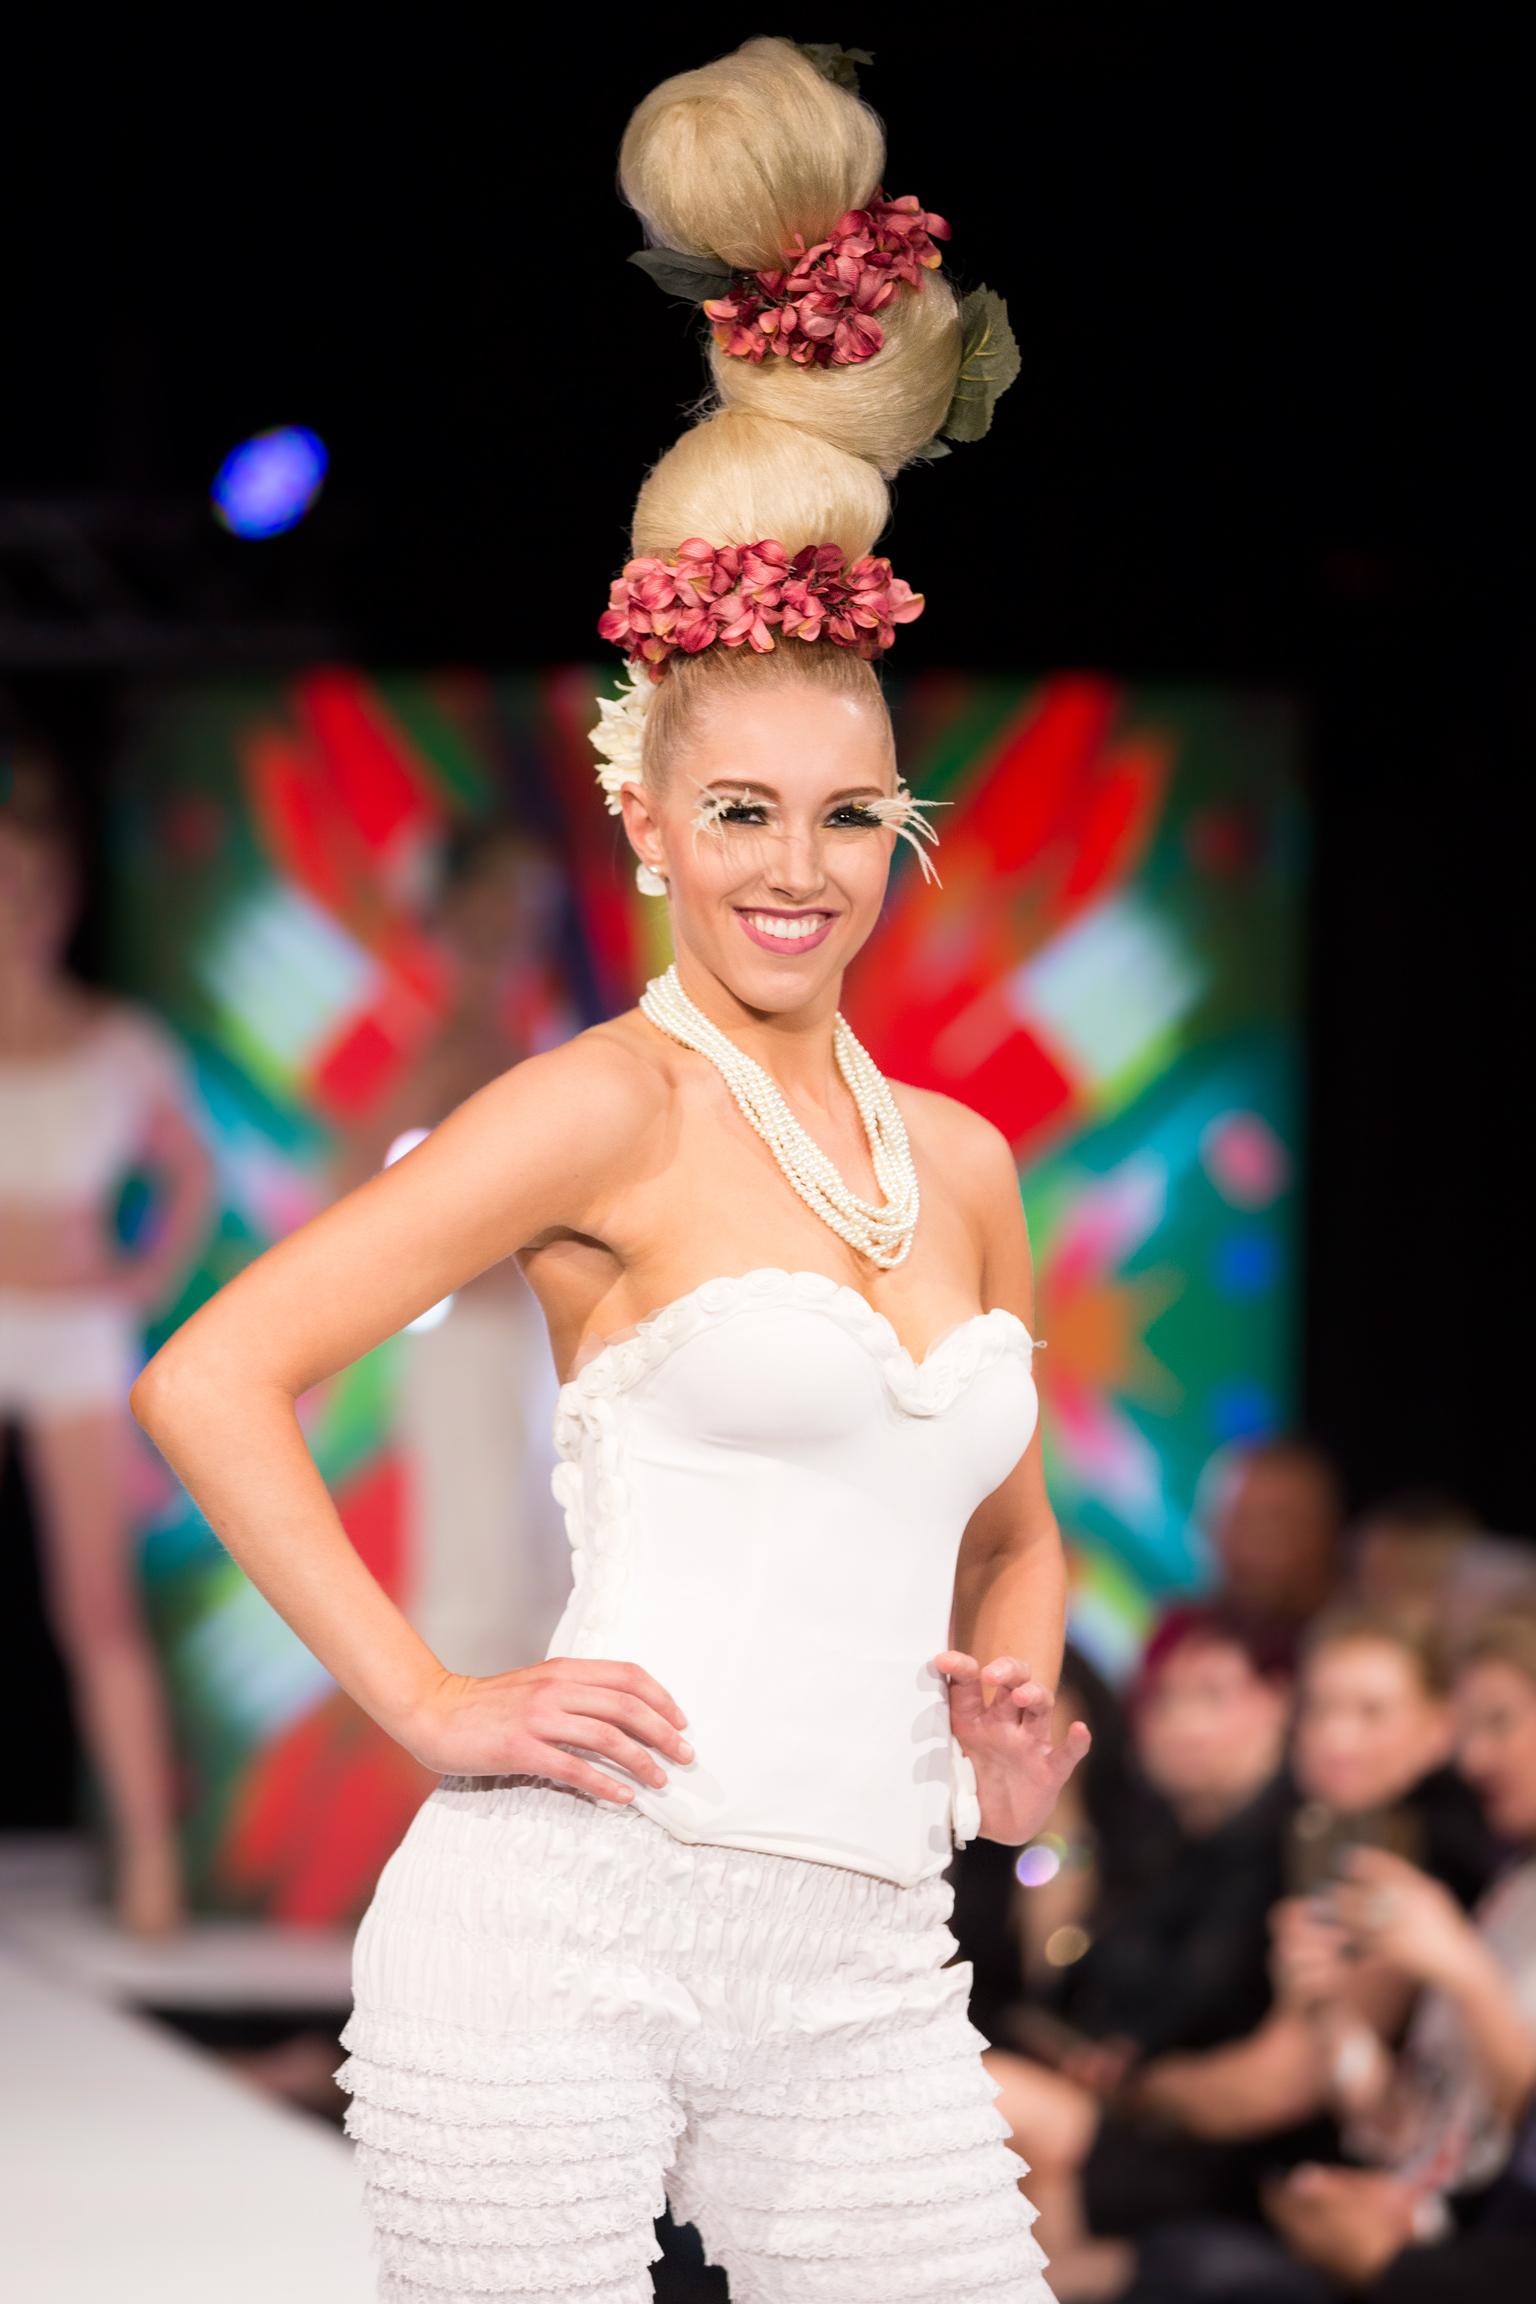 Denver-Fashion-Week-Day-4-_-Coco-Marie---010.jpg